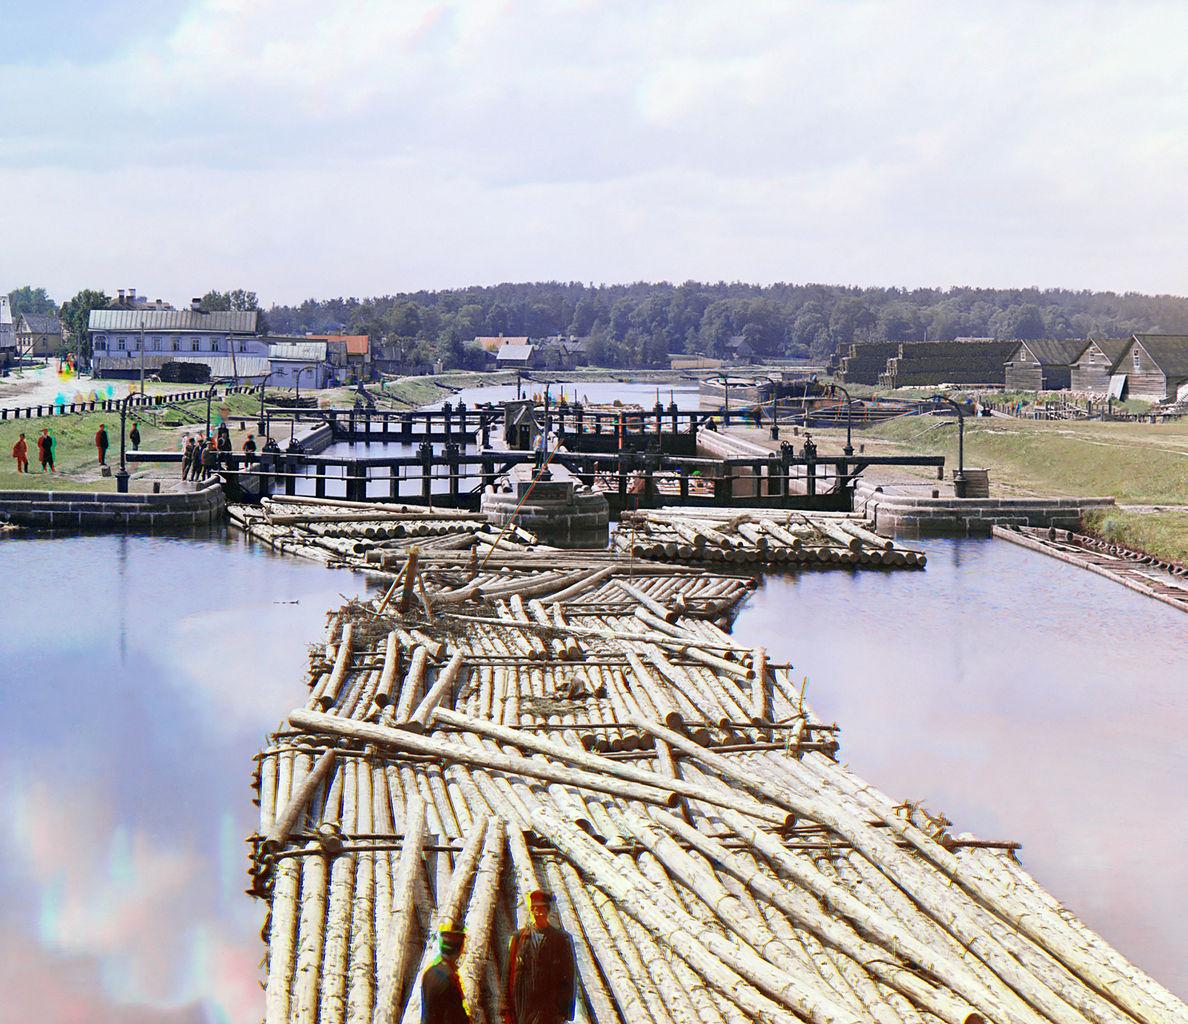 Сплав леса по Петровскому каналу. Фото 1909 г. Автор: Сергей Михайлович Прокудин-Горский